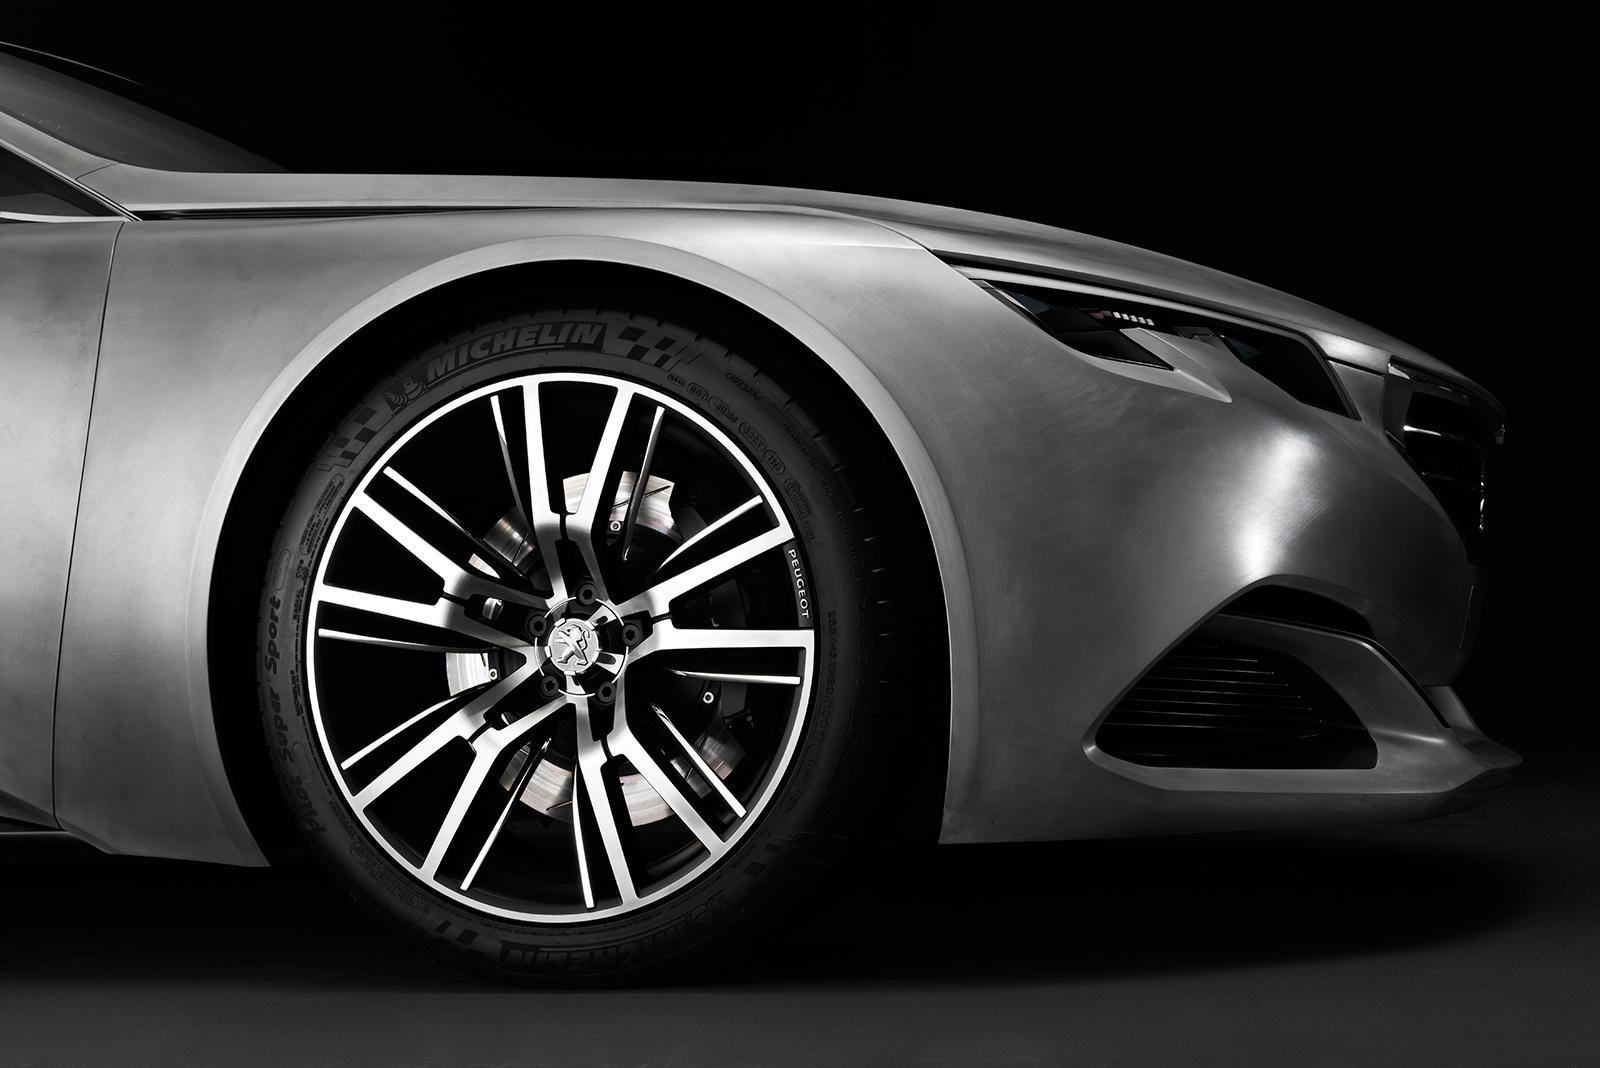 Peugeot, exalt, peugeot exalt, konsept